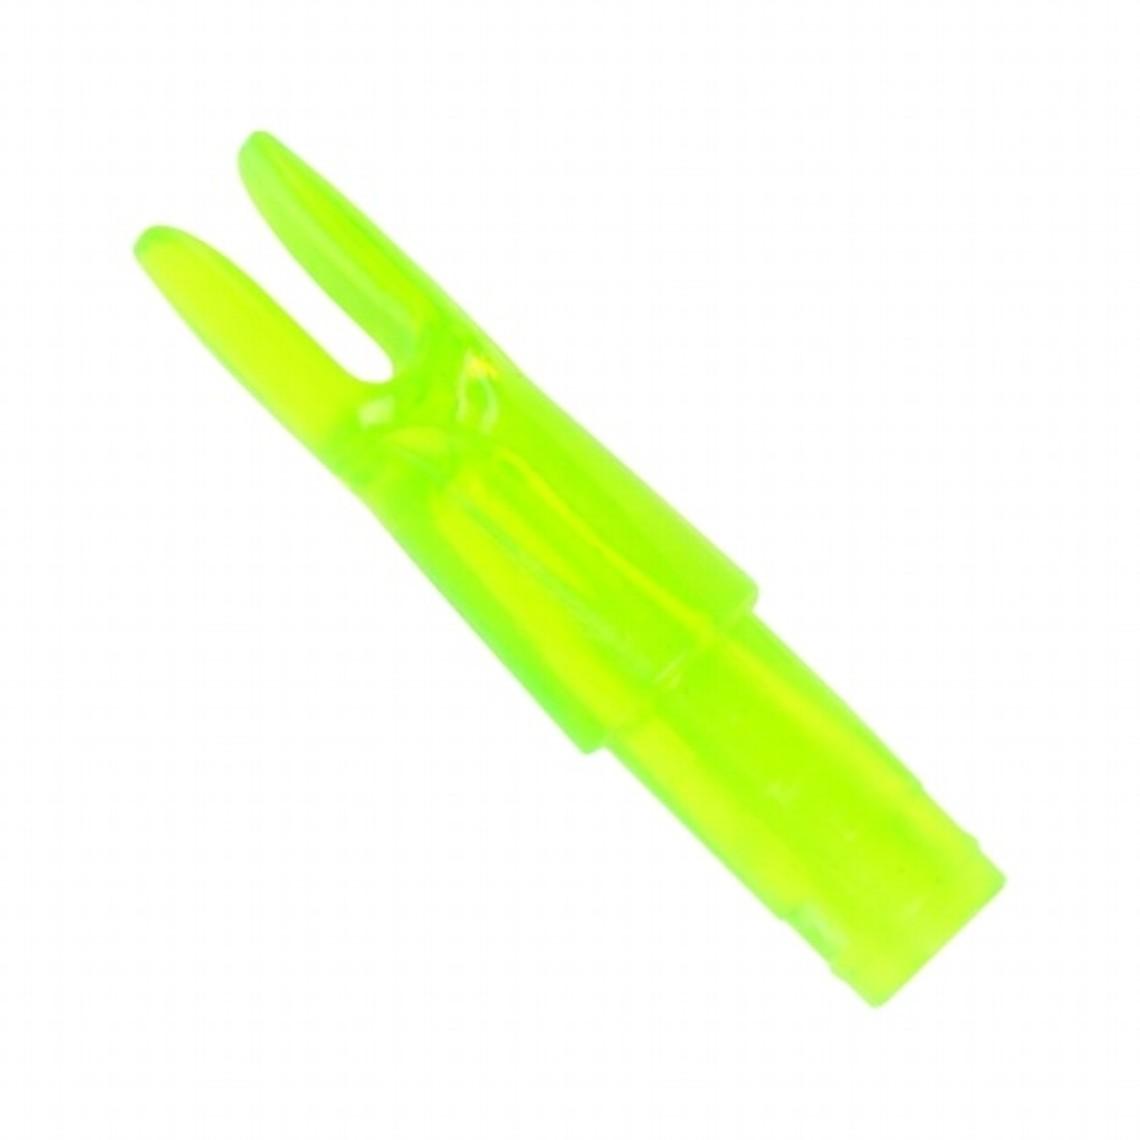 Nock para flechas de fibra de vidrio